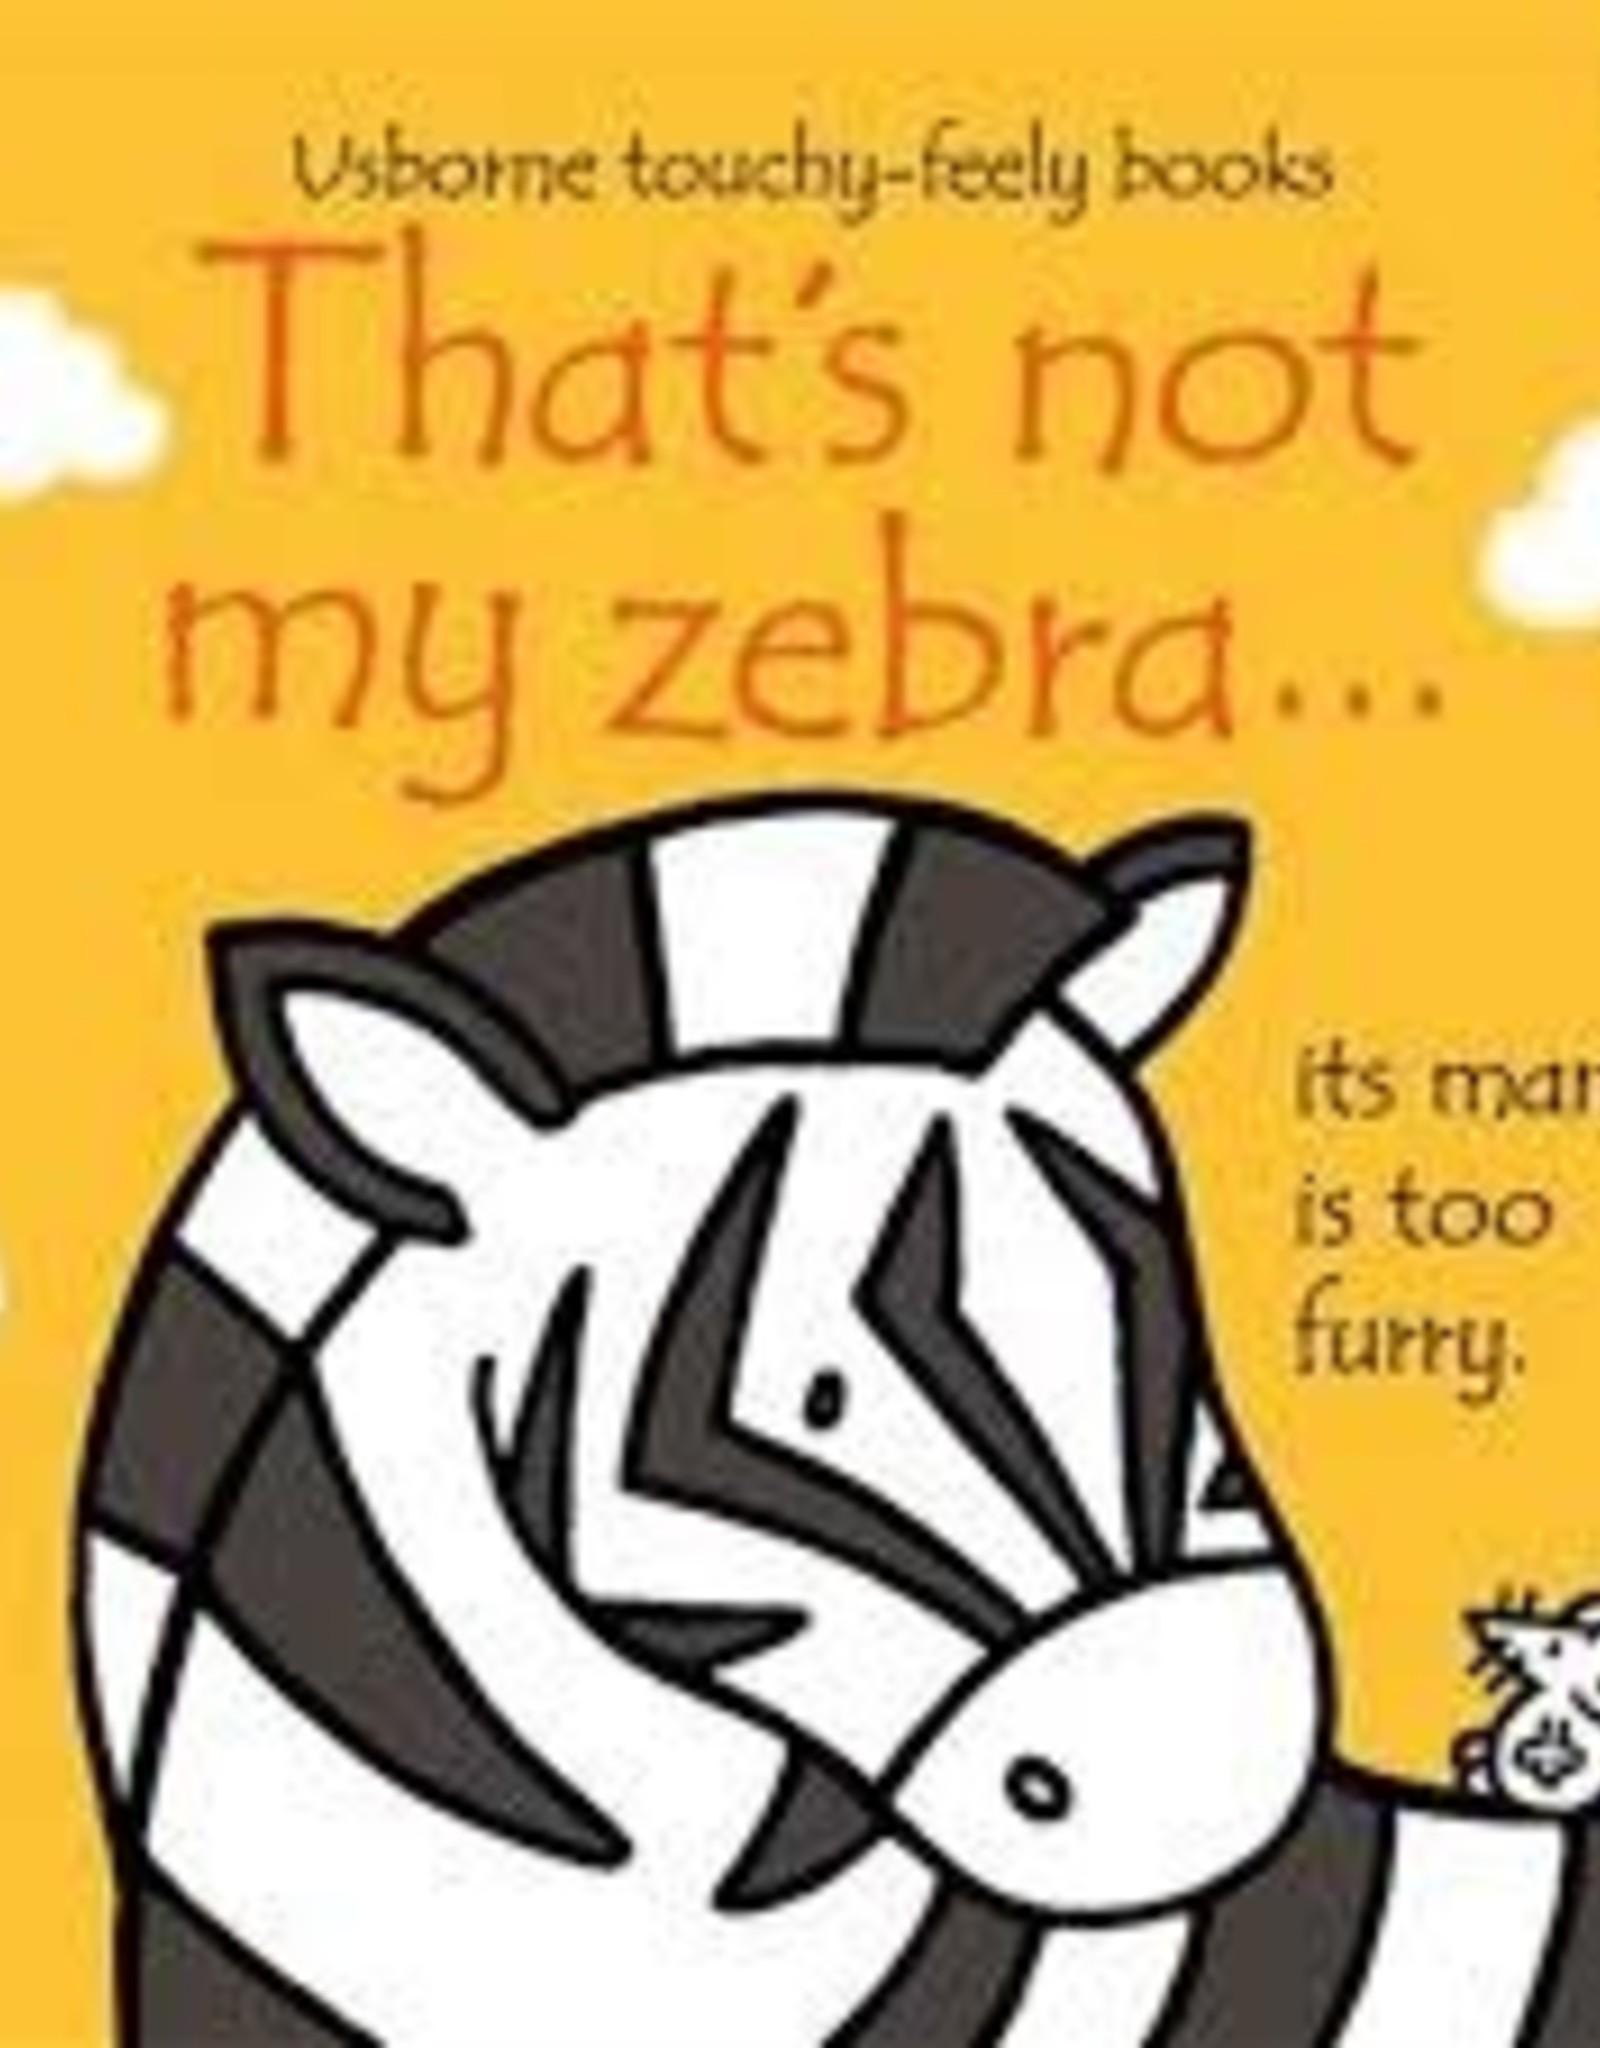 Usborne Usborne That's Not My Zebra